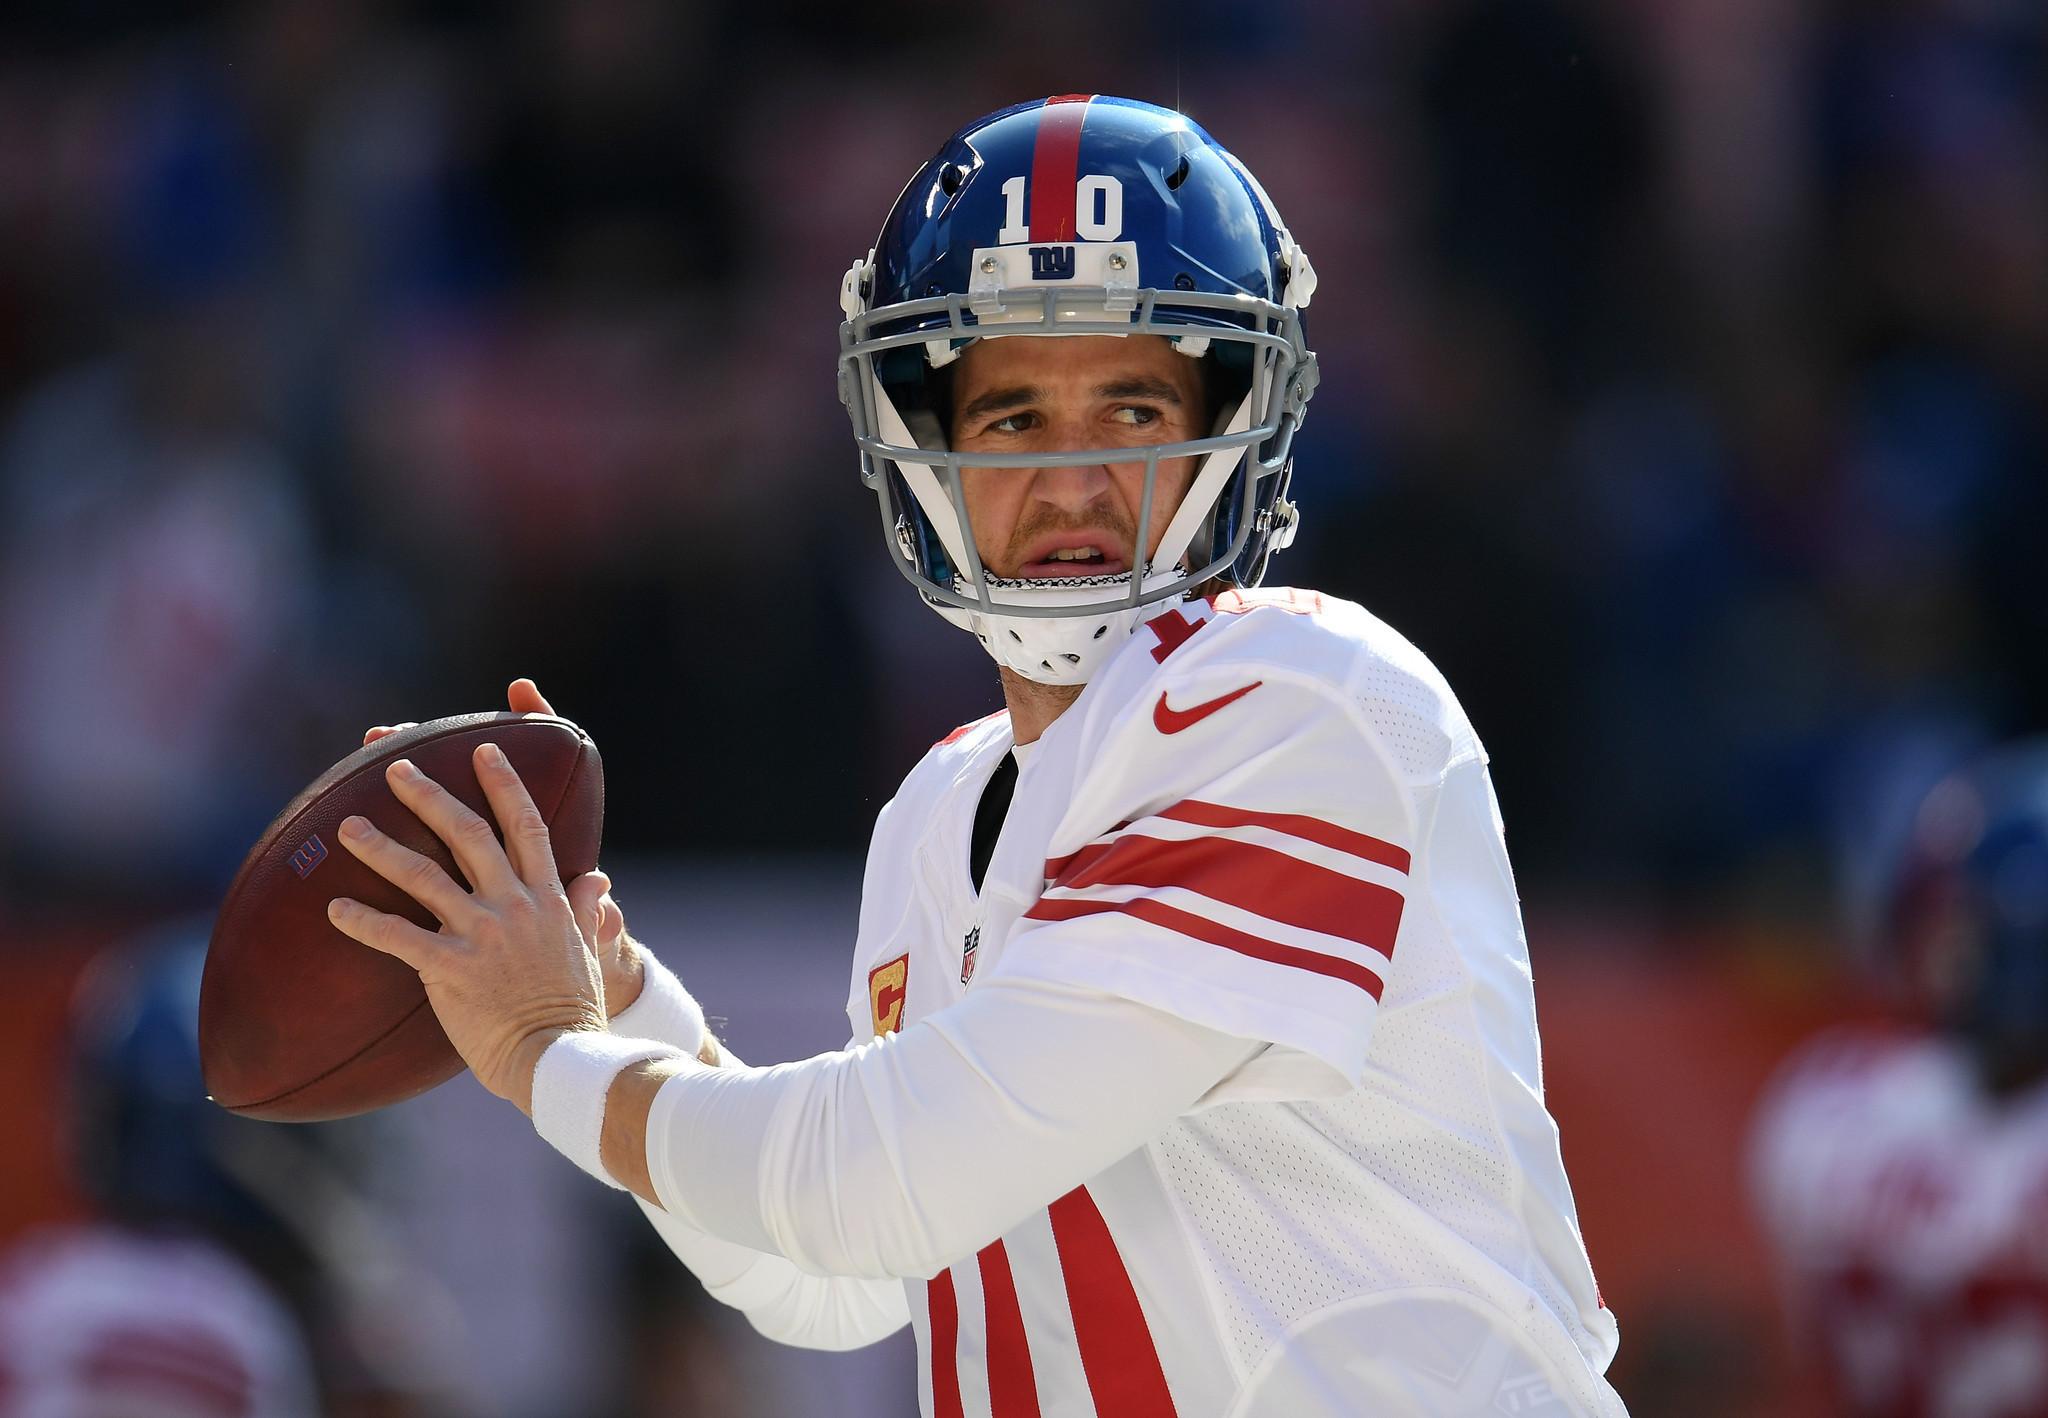 Giants Eli Manning at center of sports memorabilia scandal LA Times